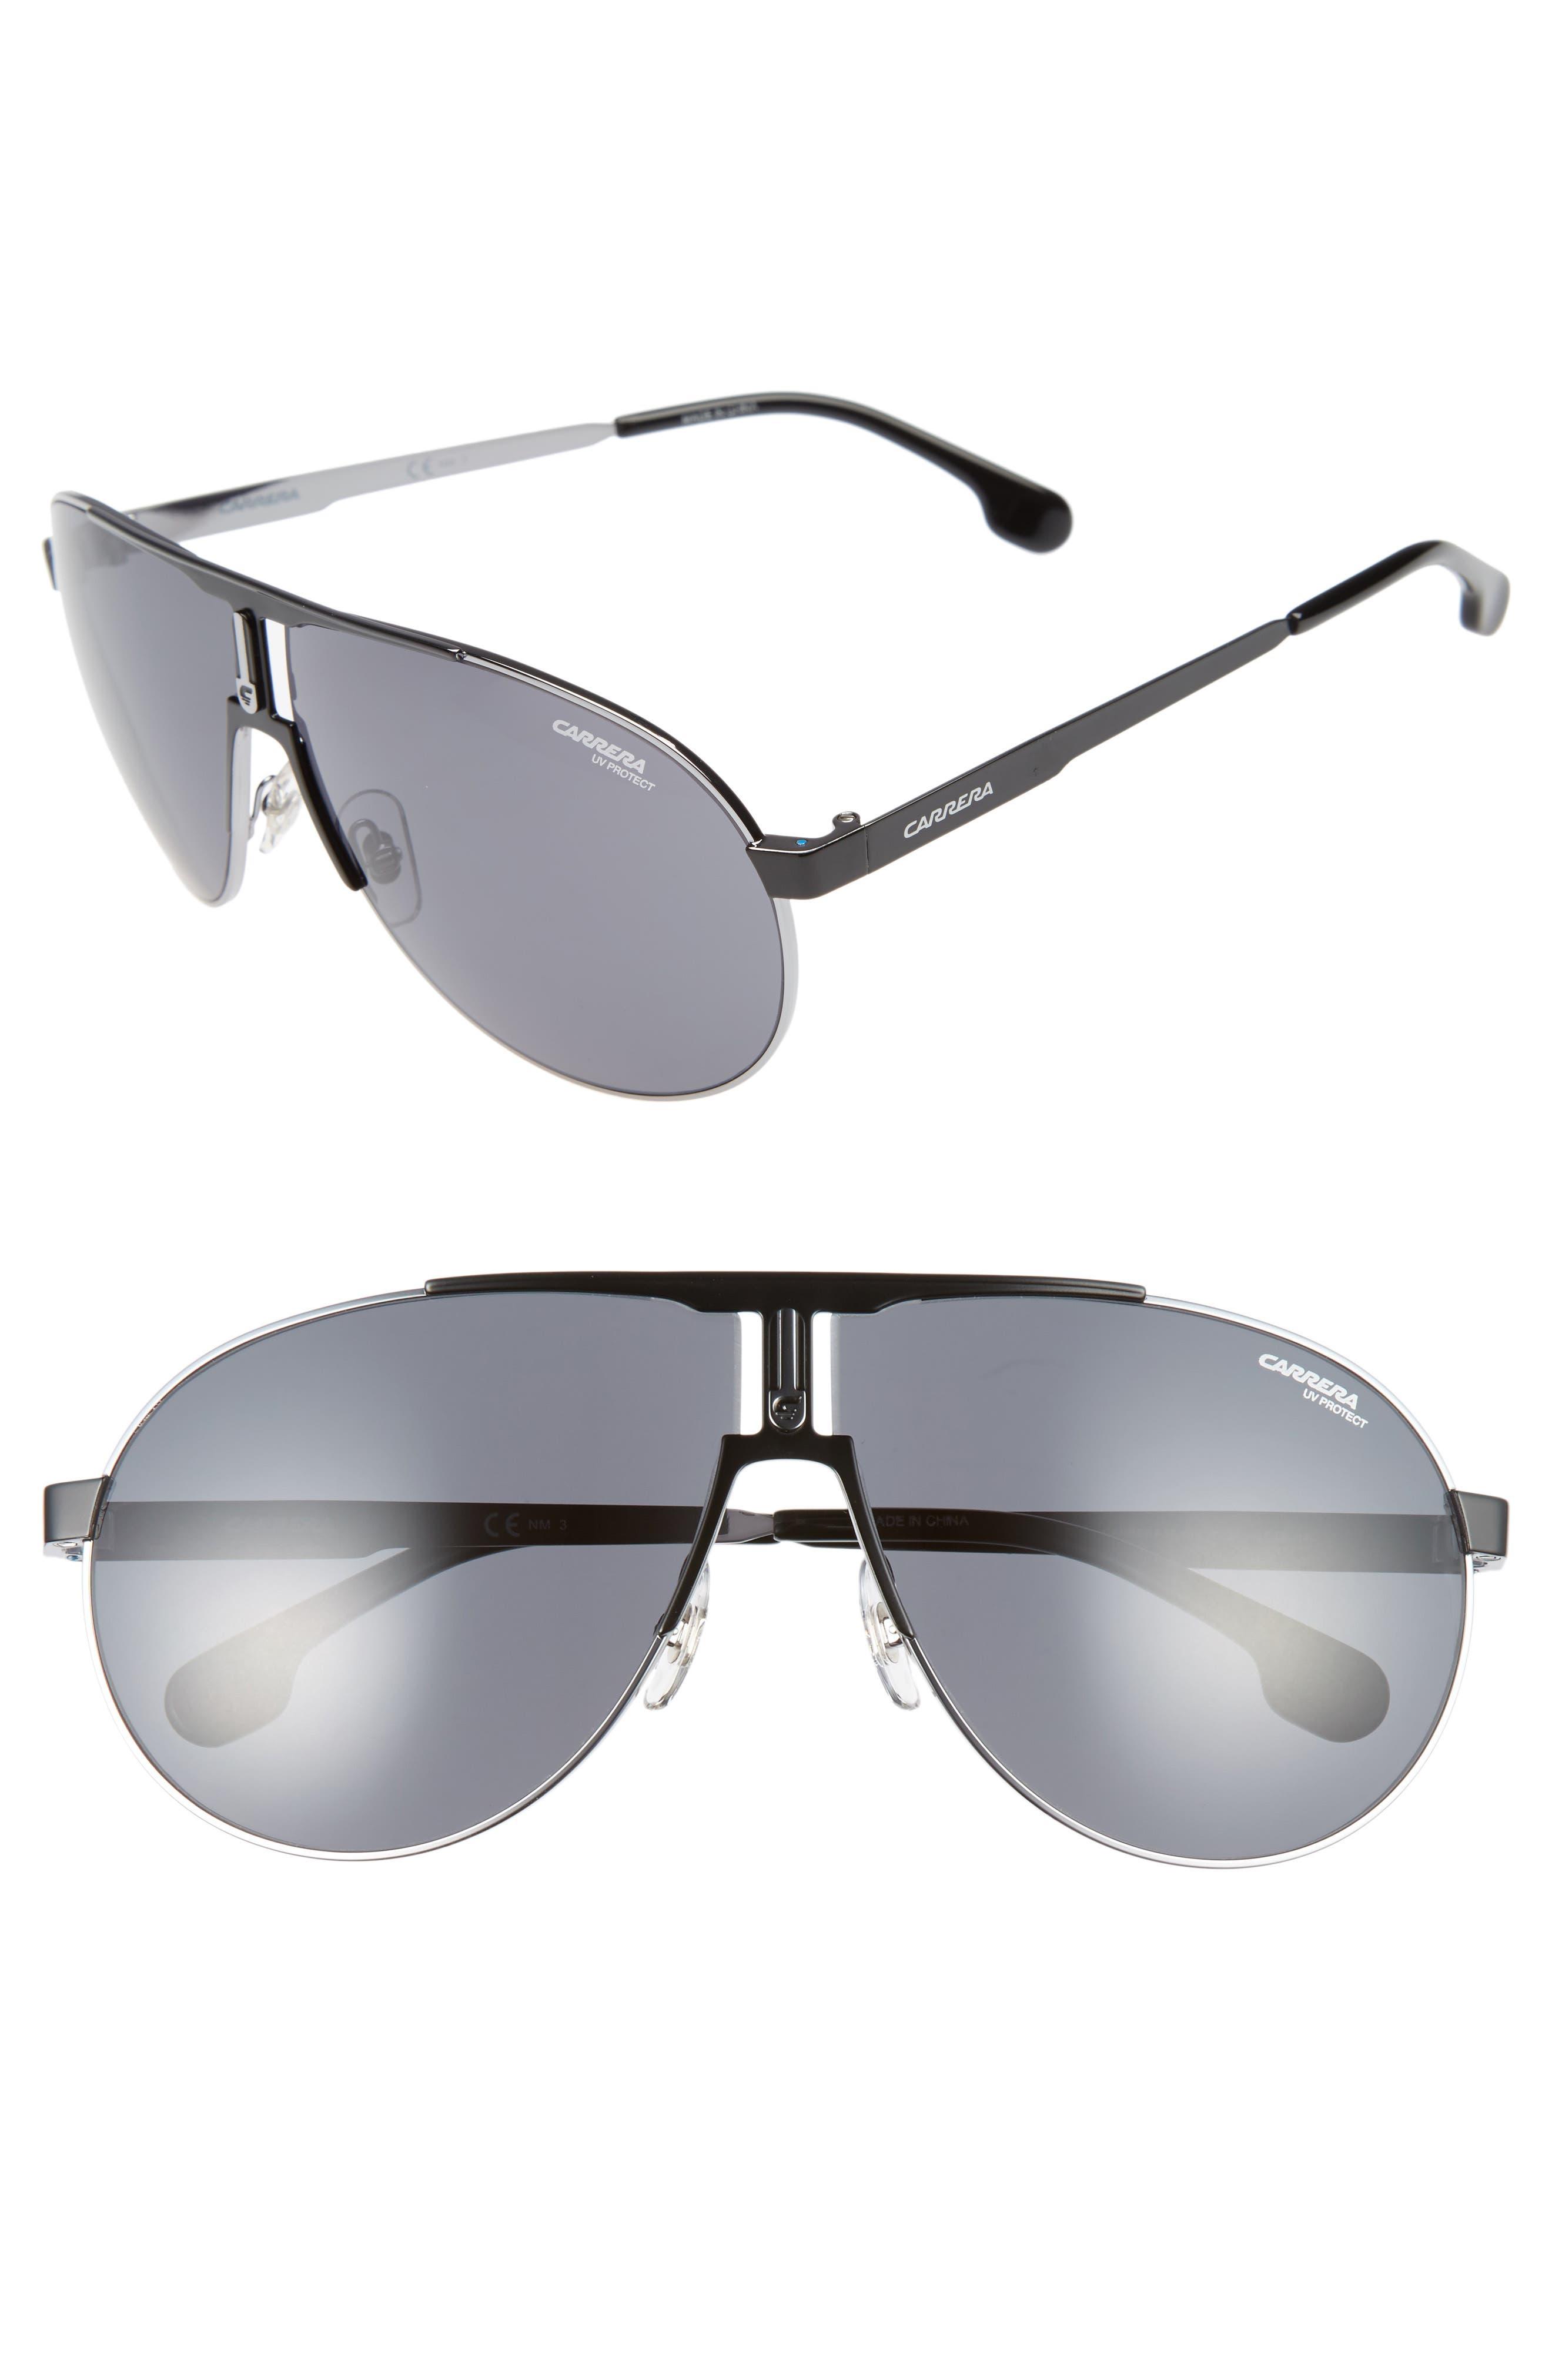 Carrera Eyewear 6m Sunglasses -